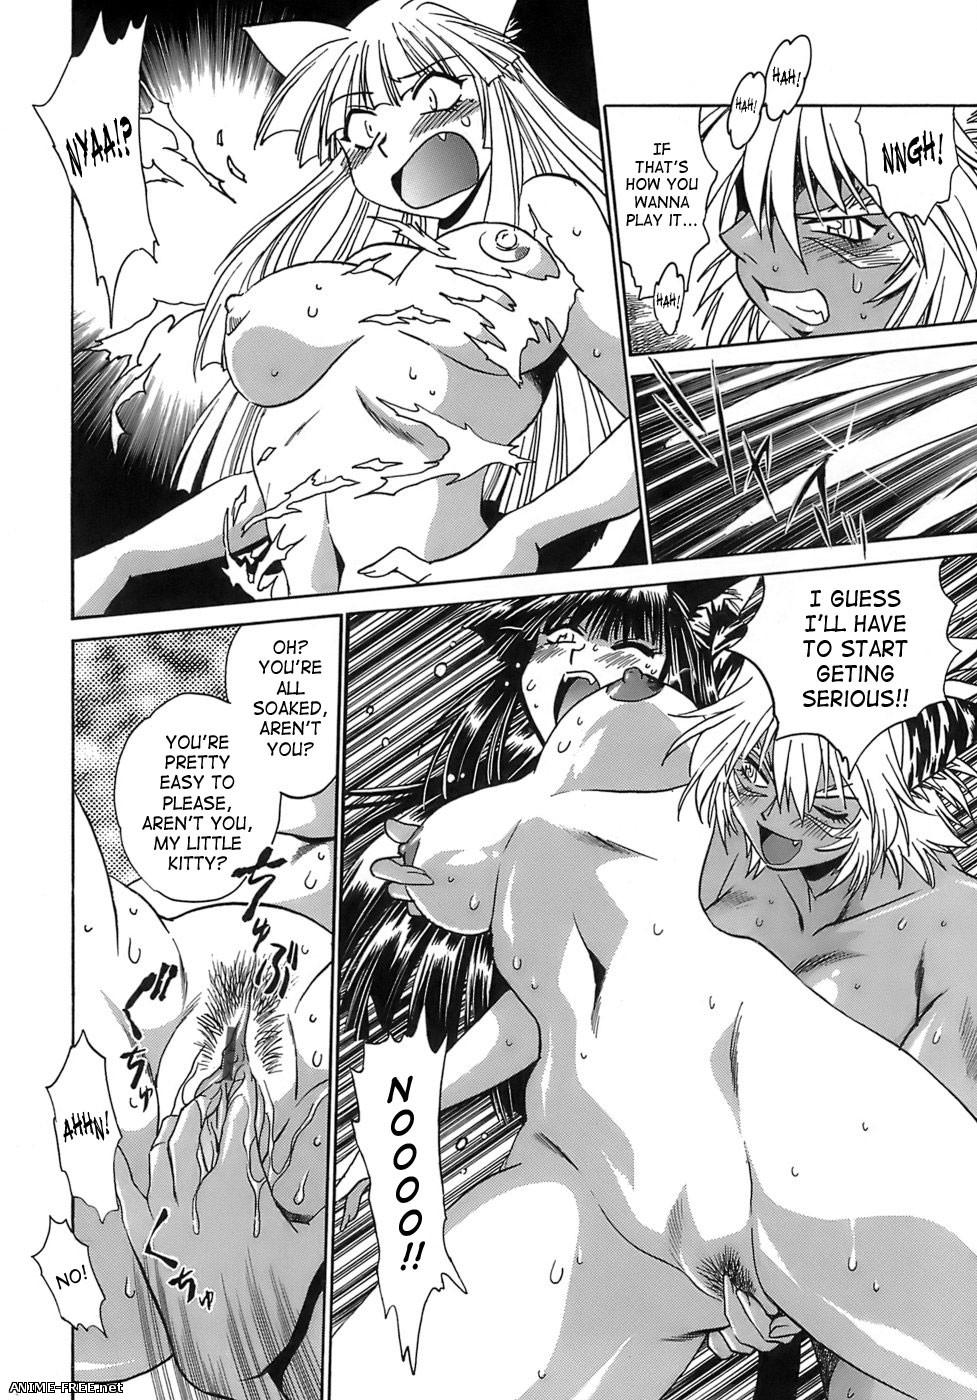 Manabe Johji / Manabe George / Studio Katsudon (Collection) - Сборник хентай манги [Ptcen] [RUS,ENG,JAP] Manga Hentai